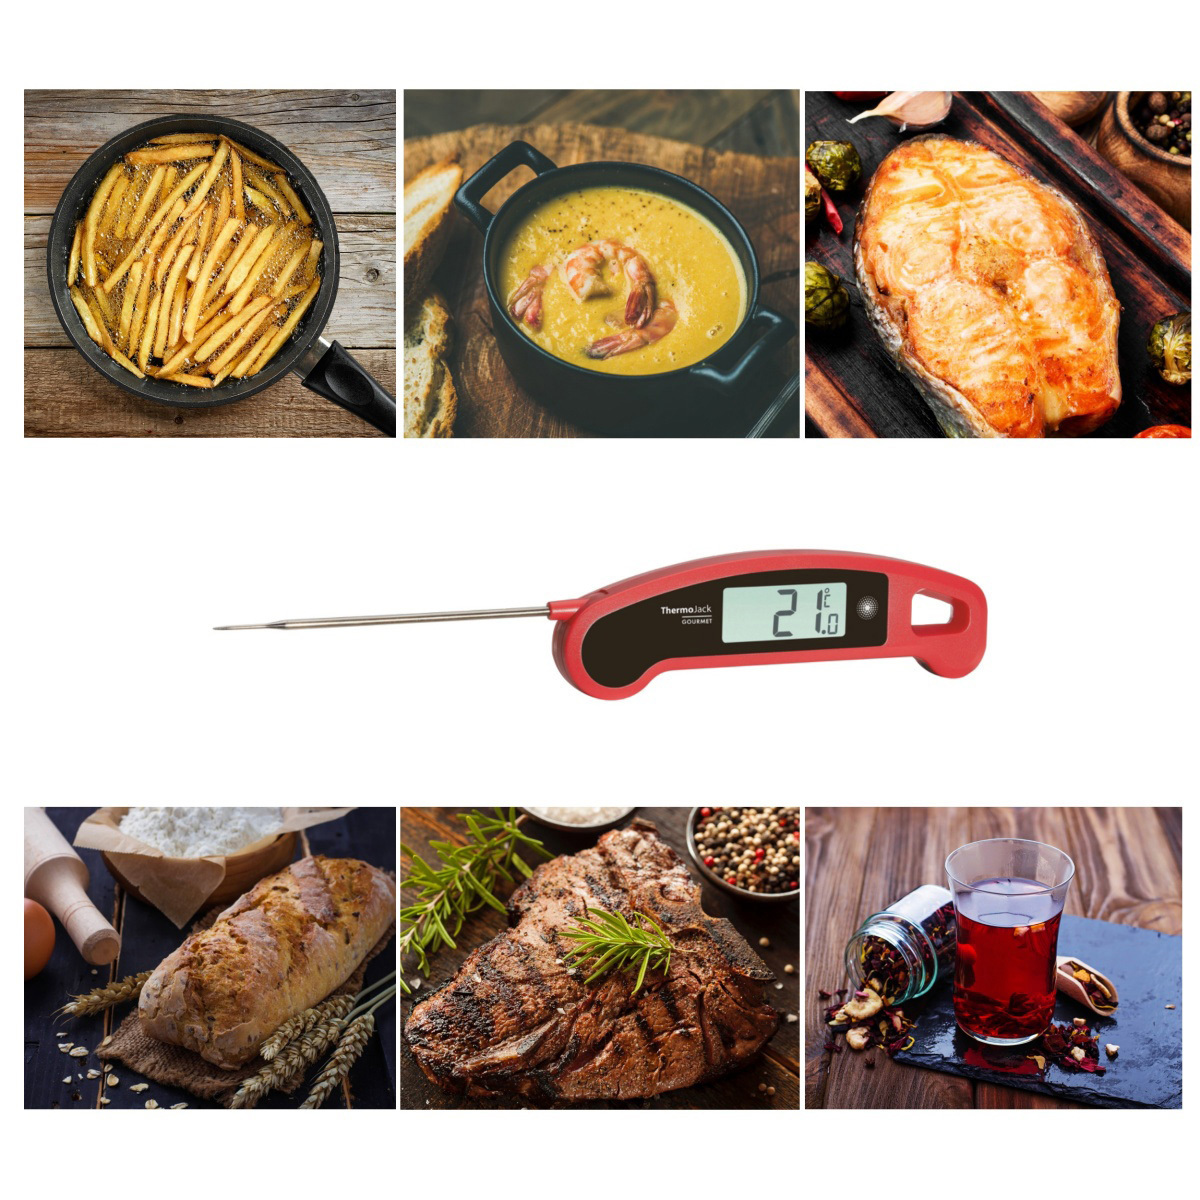 30-1060-05-profi-küchenthermometer-thermo-jack-gourmet-anwendung-1200x1200px.jpg